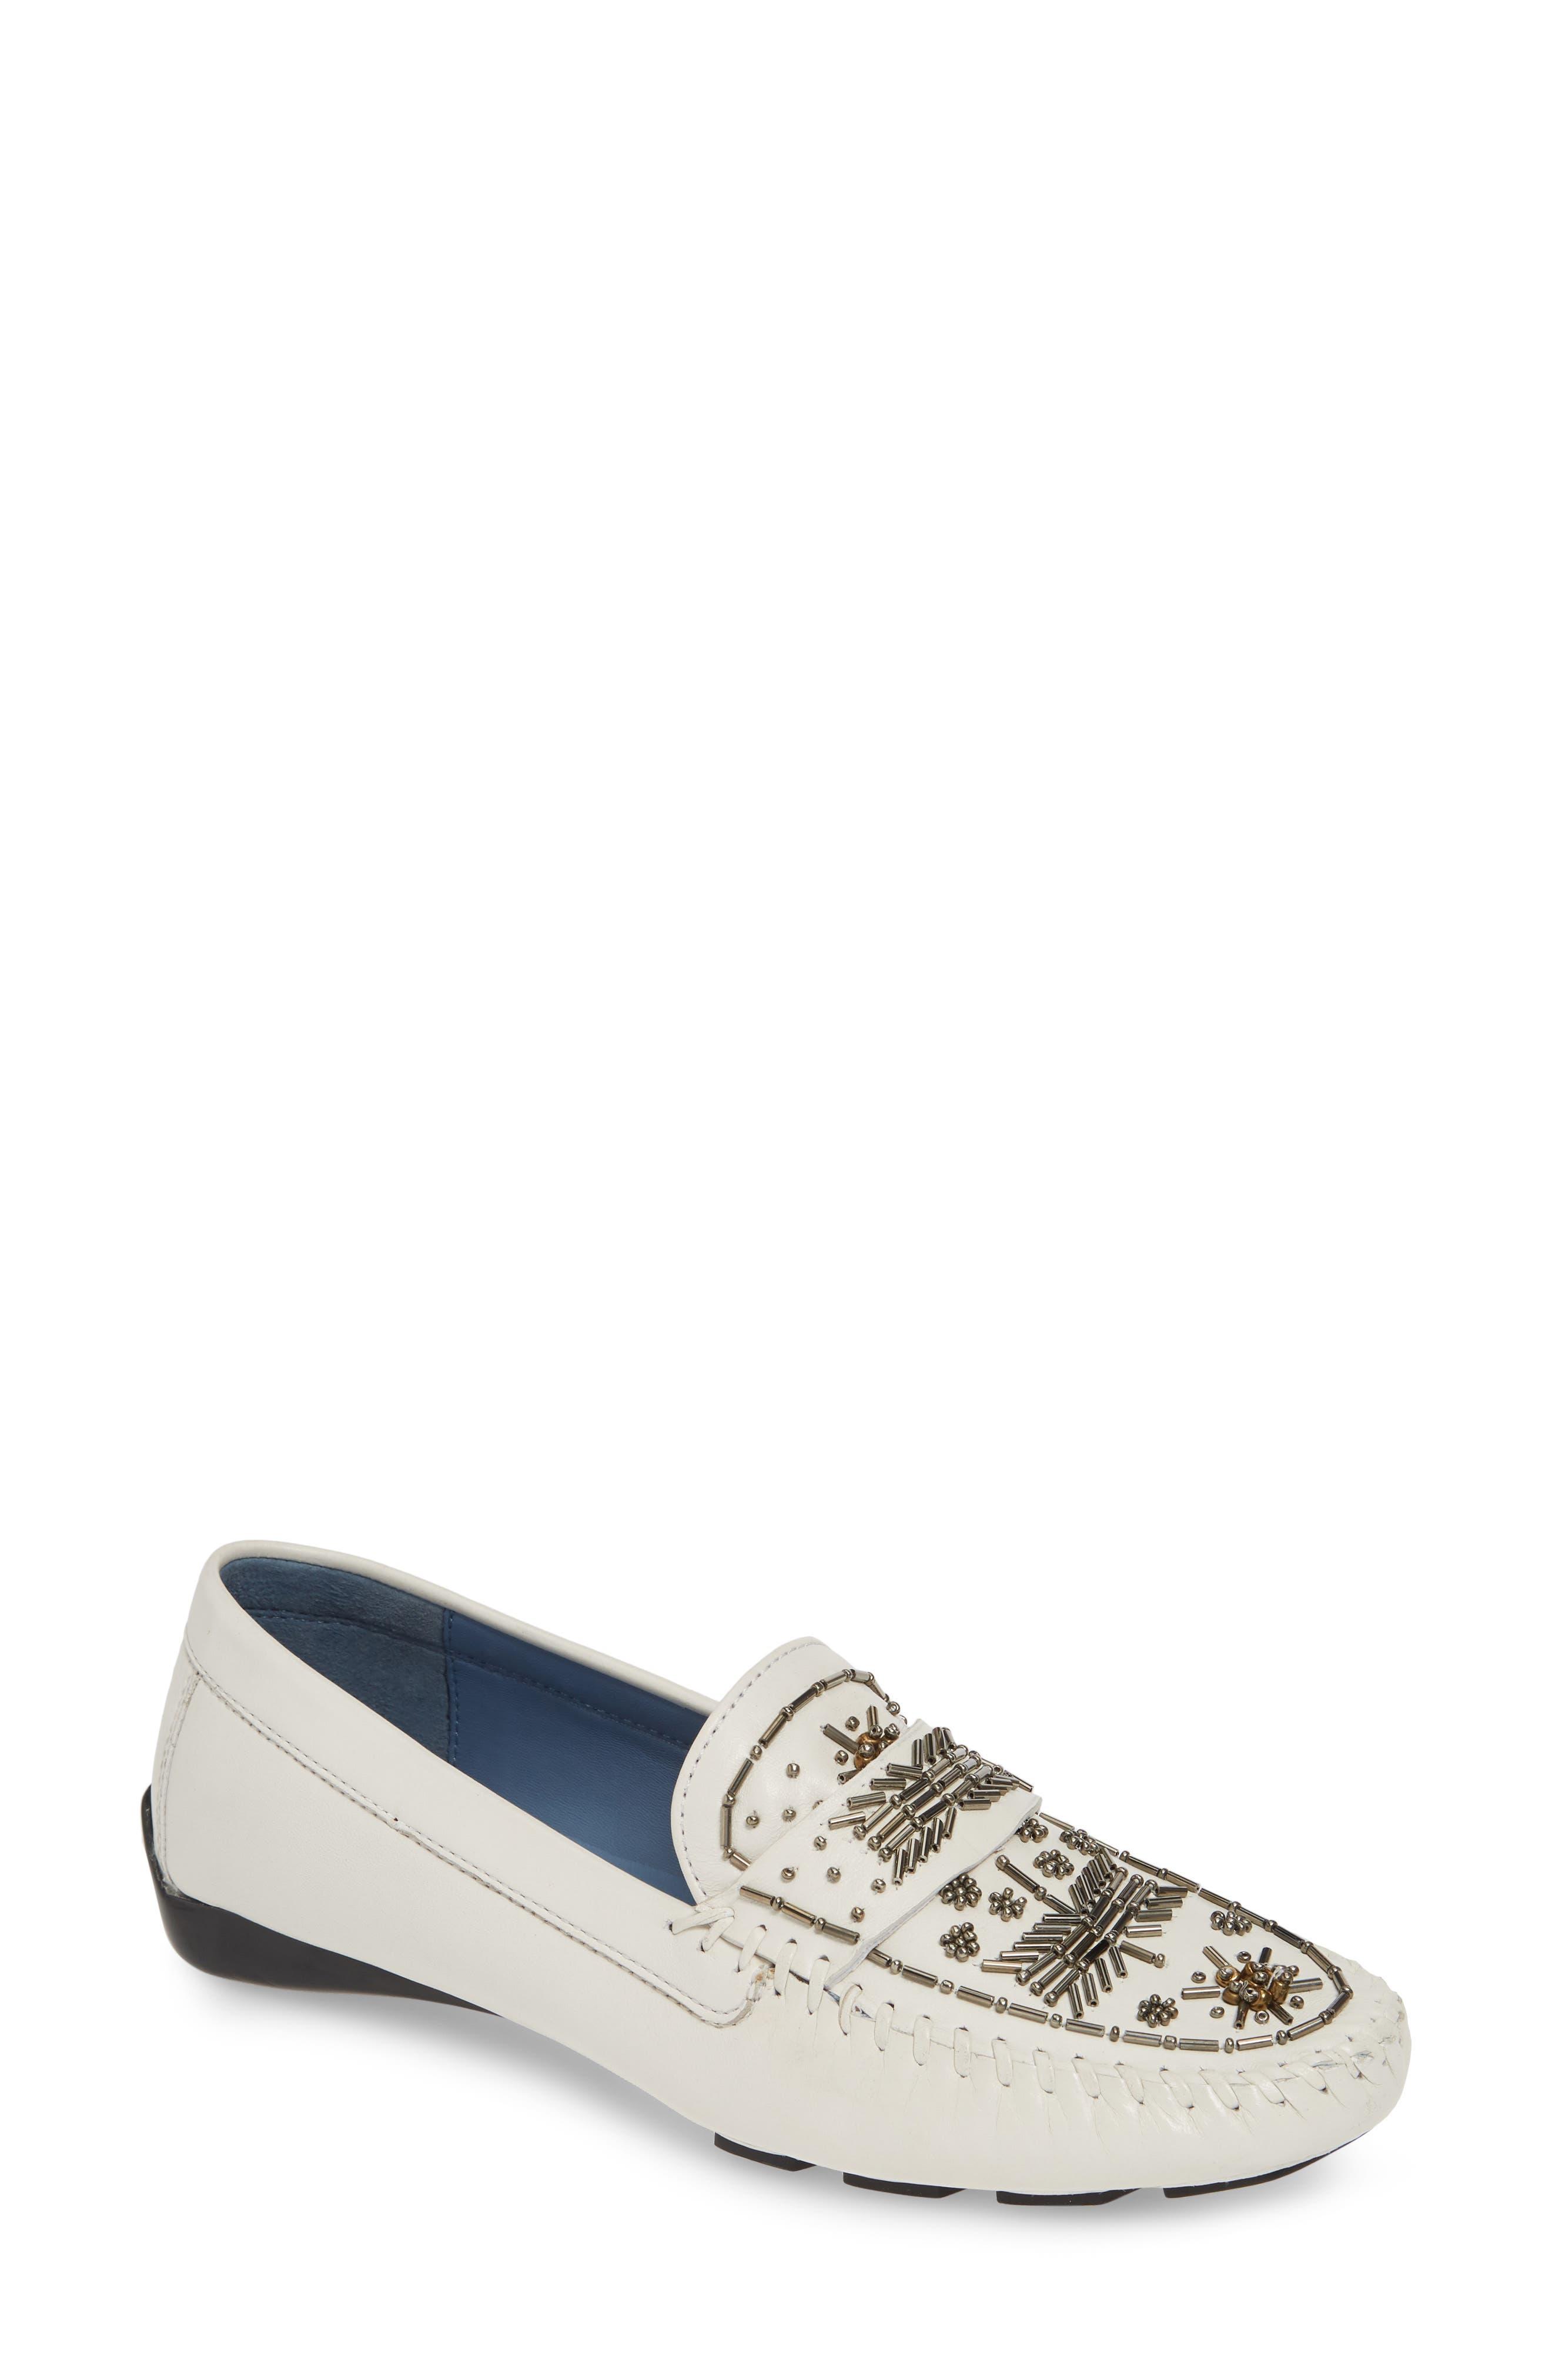 ee0e222ad57 Women s Robert Zur Comfortable Shoes